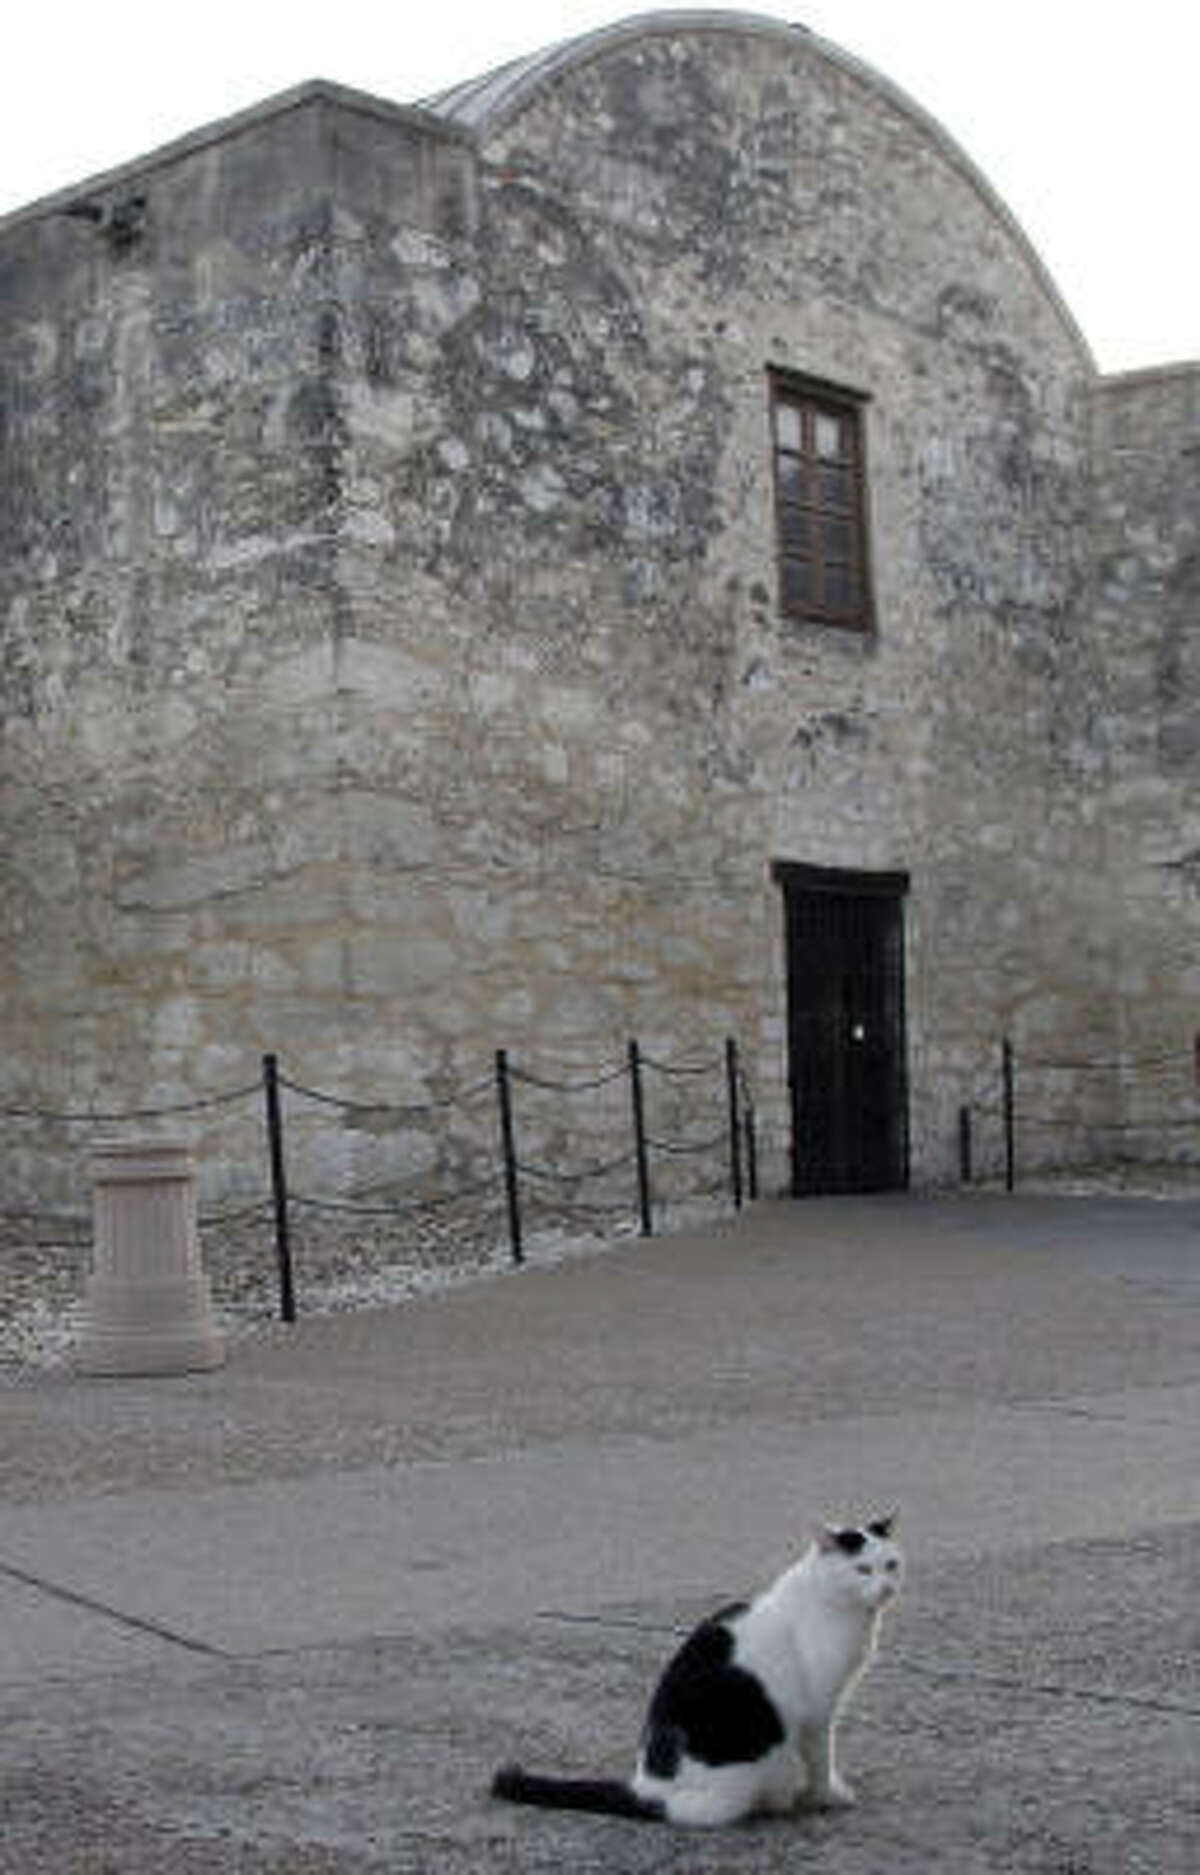 Clara Carmack, aka C.C., the Alamo Cat, resides at Texas' most well known landmark, the Alamo.